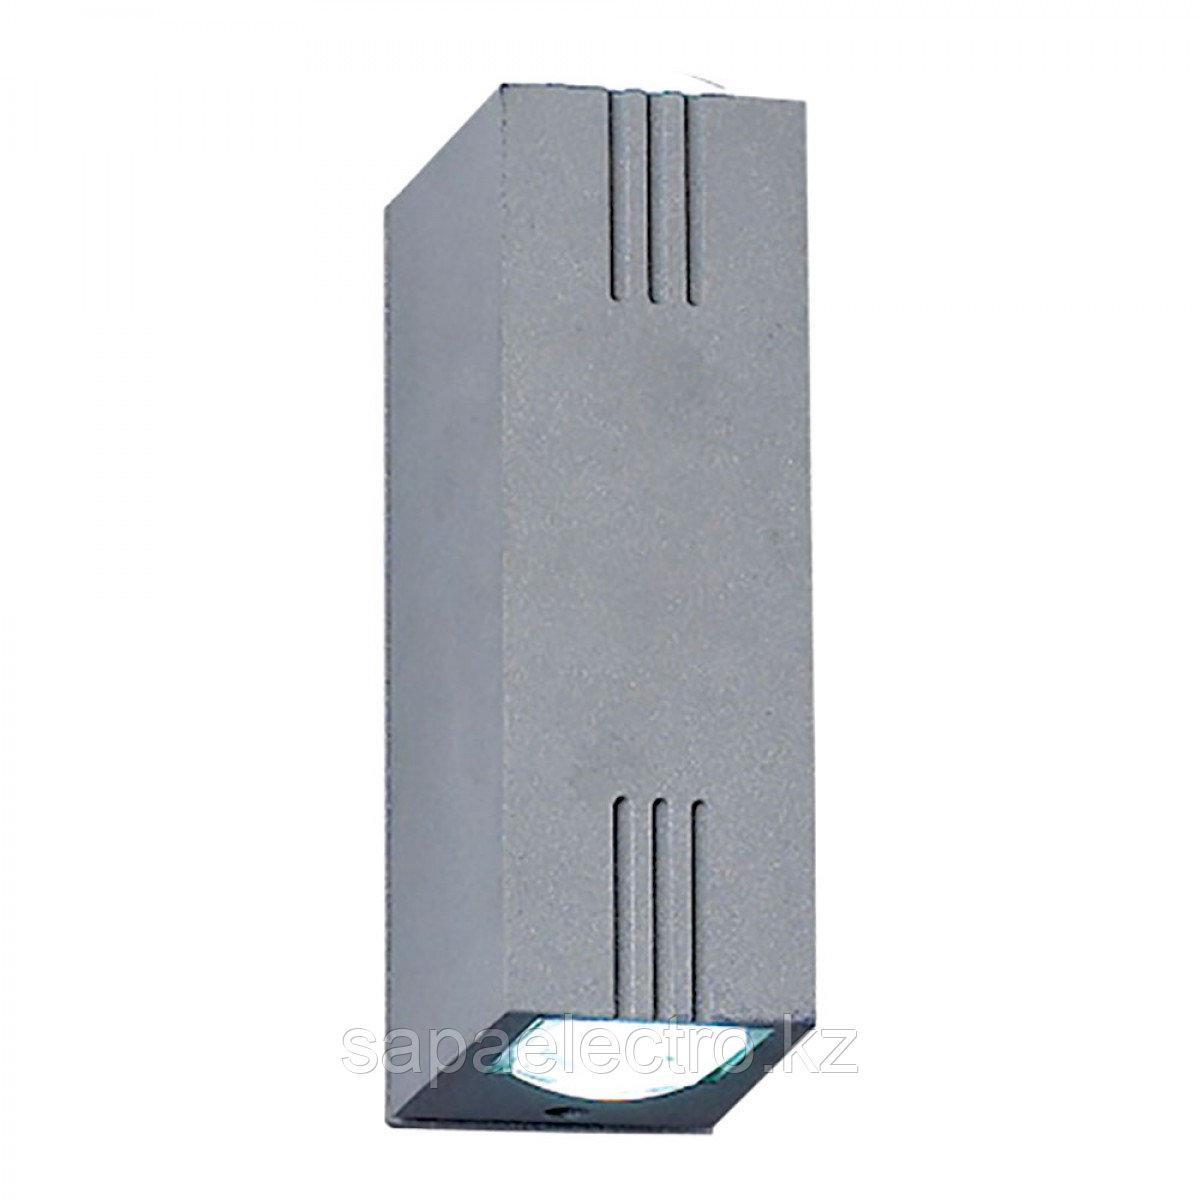 Свет-к  X3000B-2W  WHITE   2X1W LED IP54 (TS)20шт